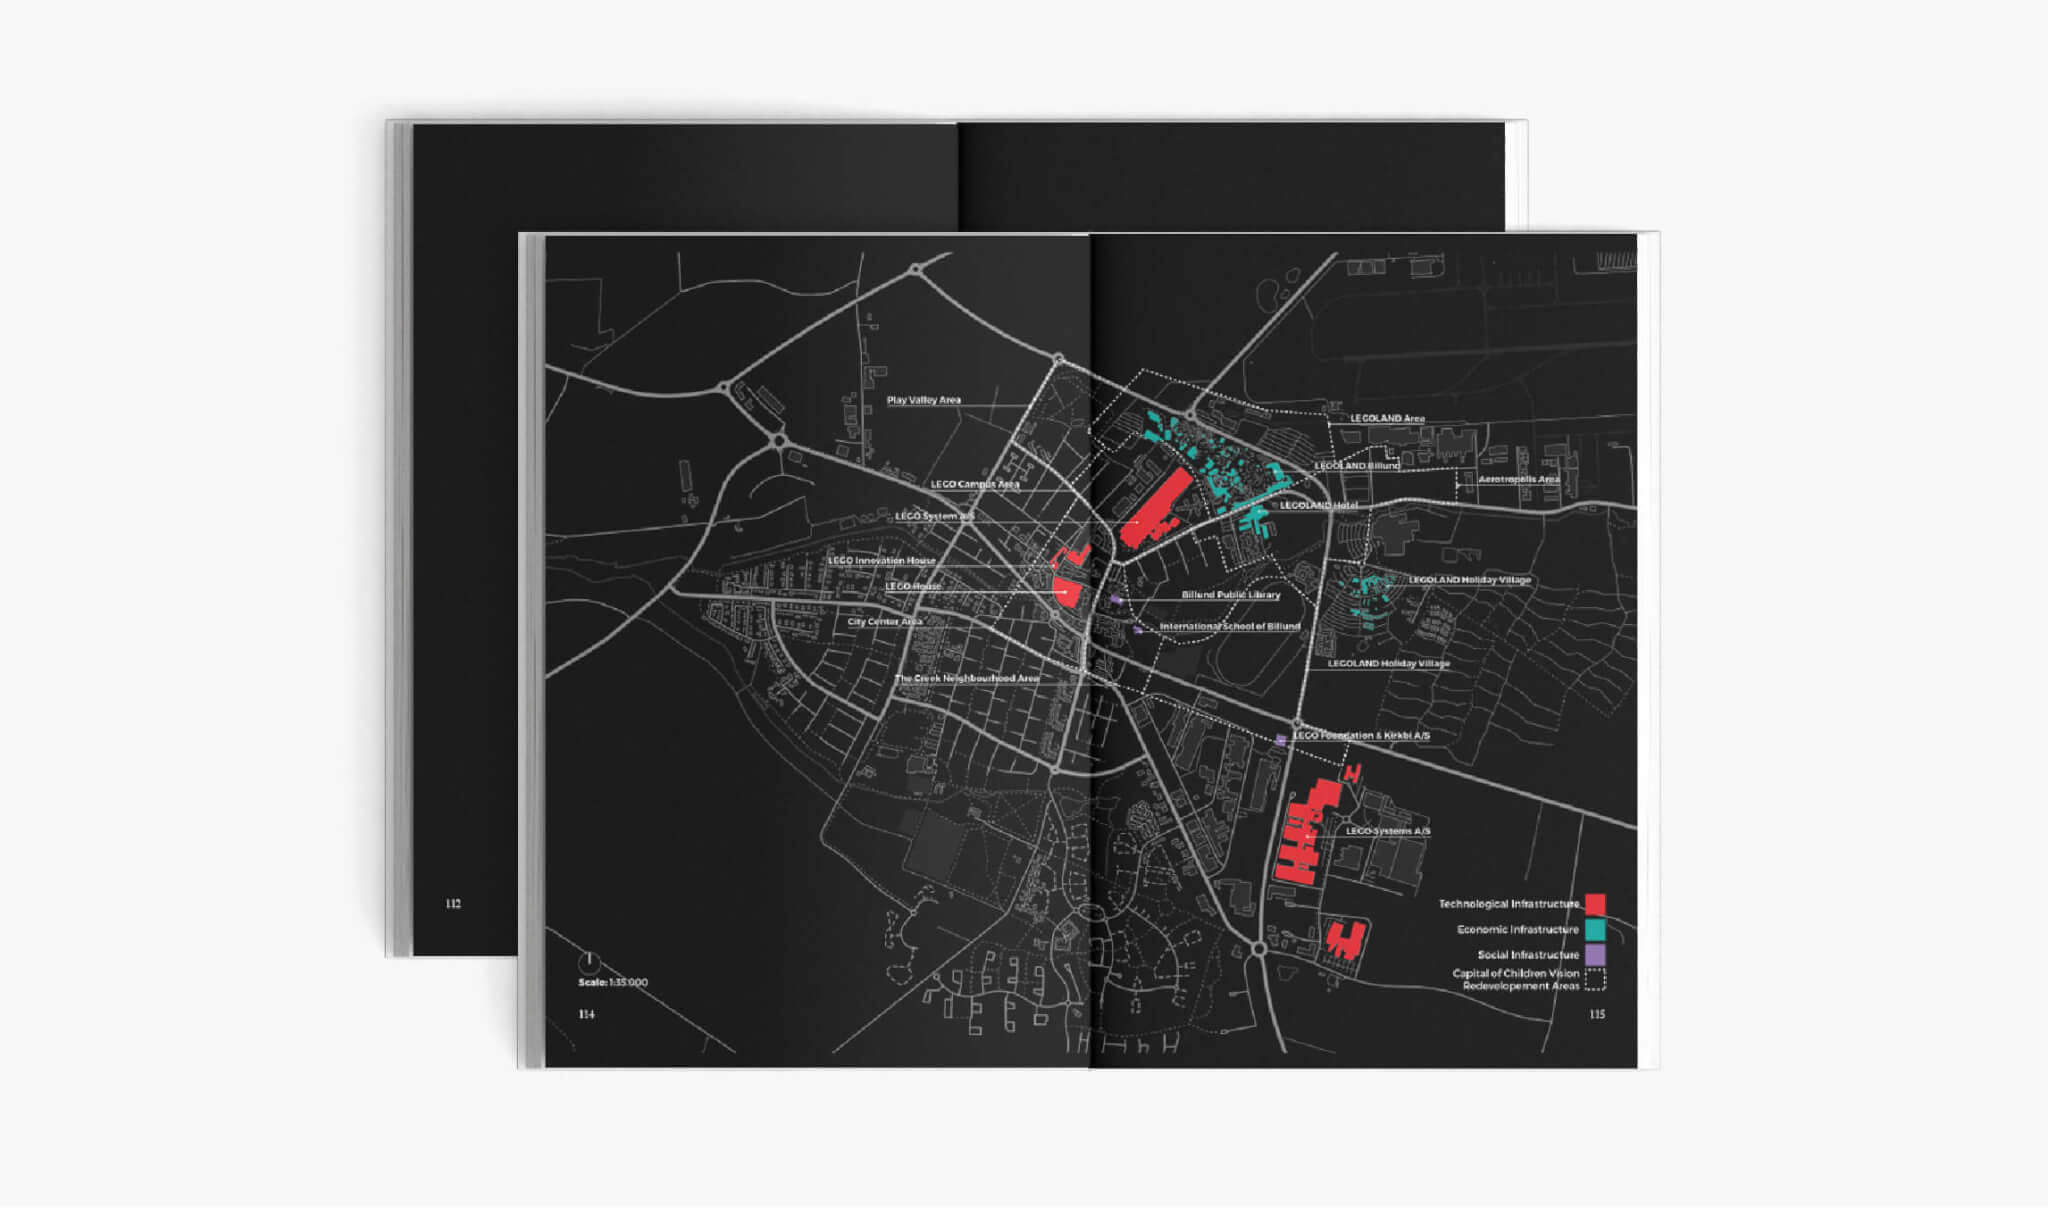 studio-interrobang-corporate-landscapes-mapping13